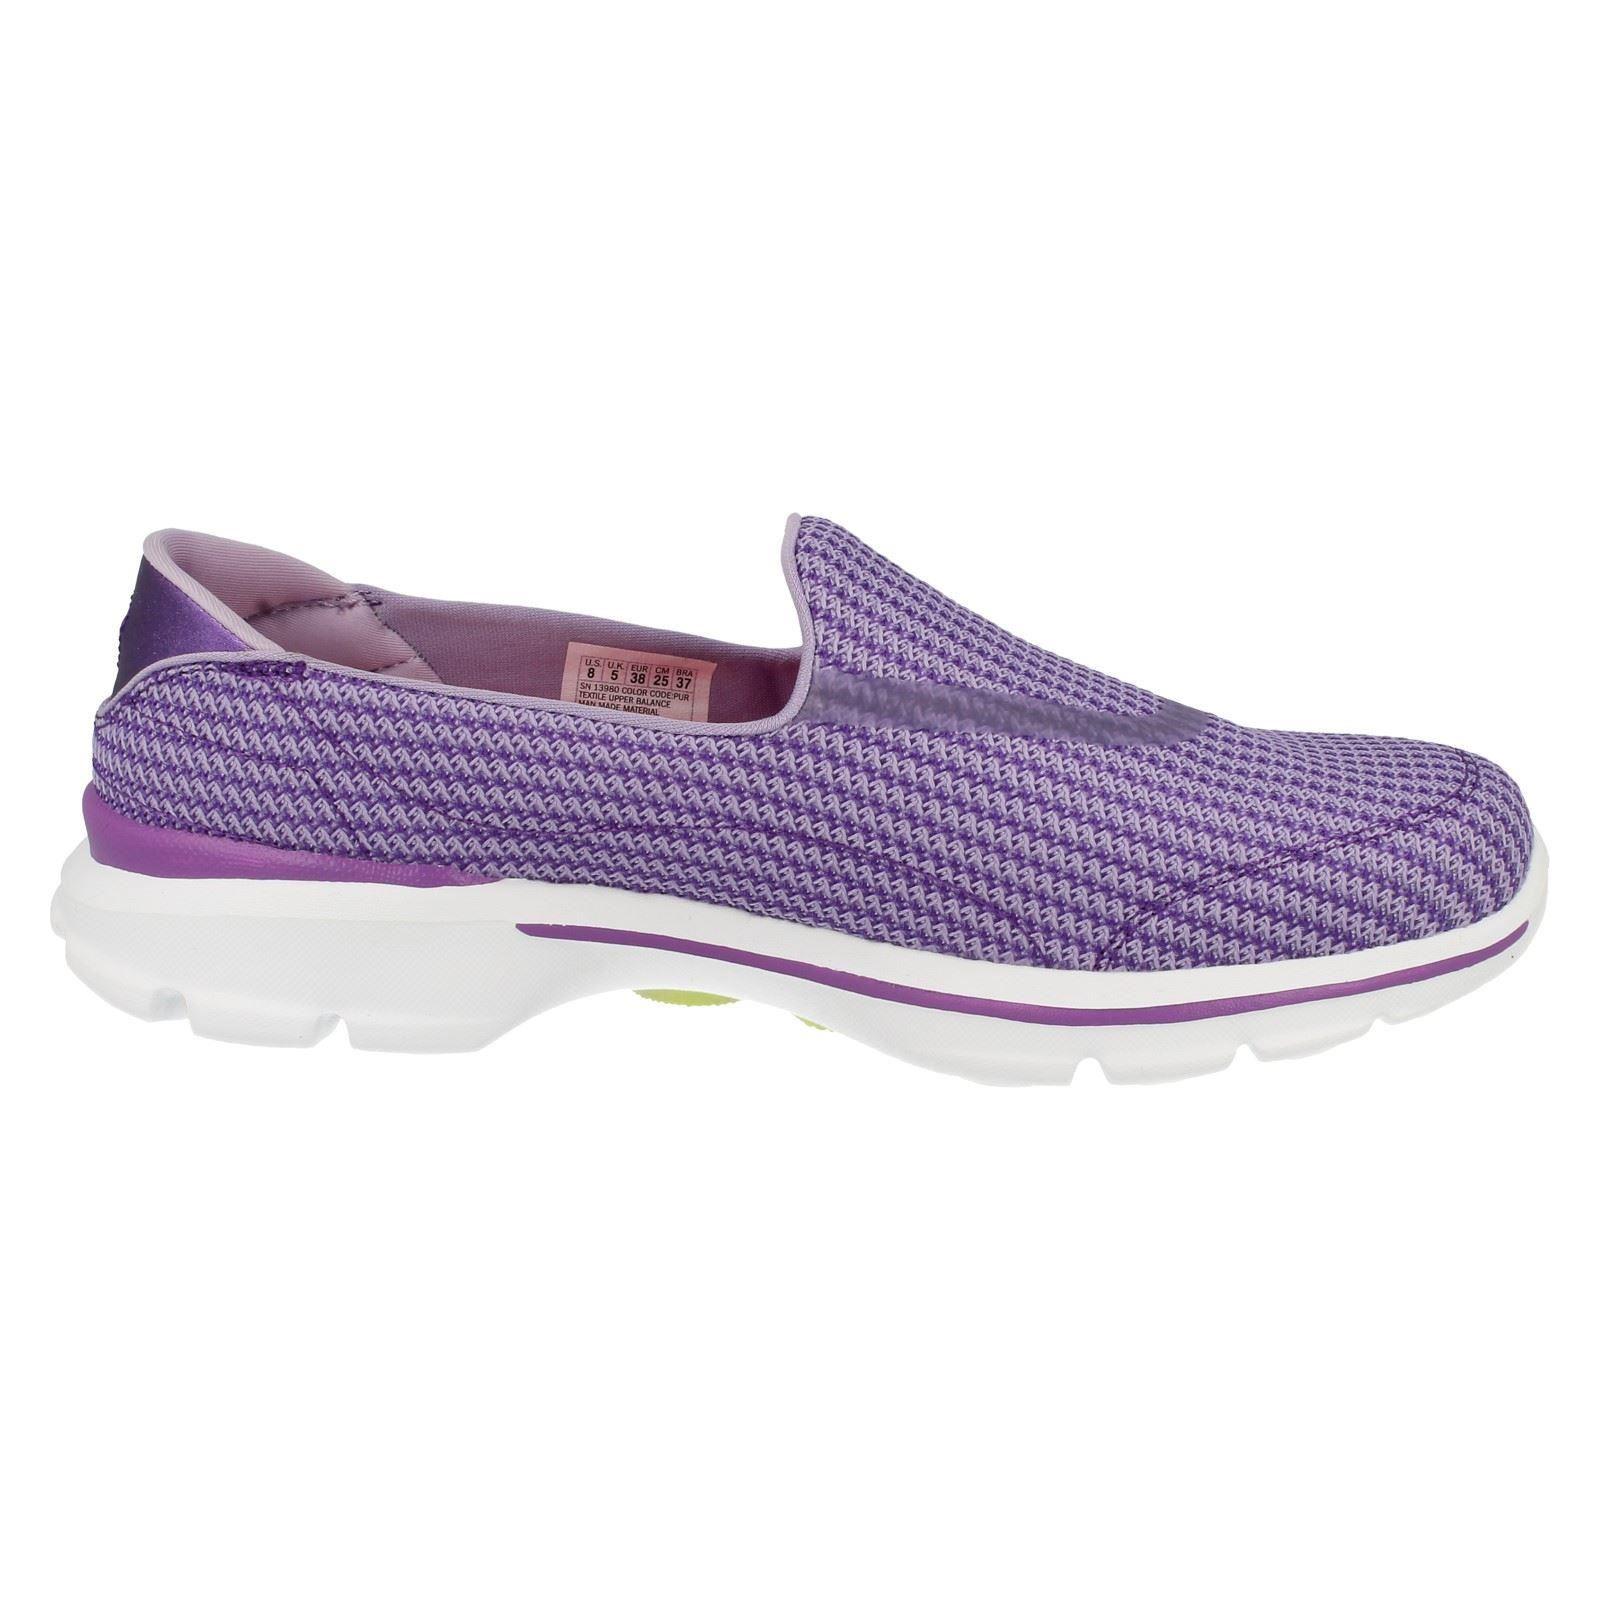 Ladies Ladies Ladies Skechers GoGa Mat Casual Slip On Textile Pumps Go Walk 3 13980 eeffa5